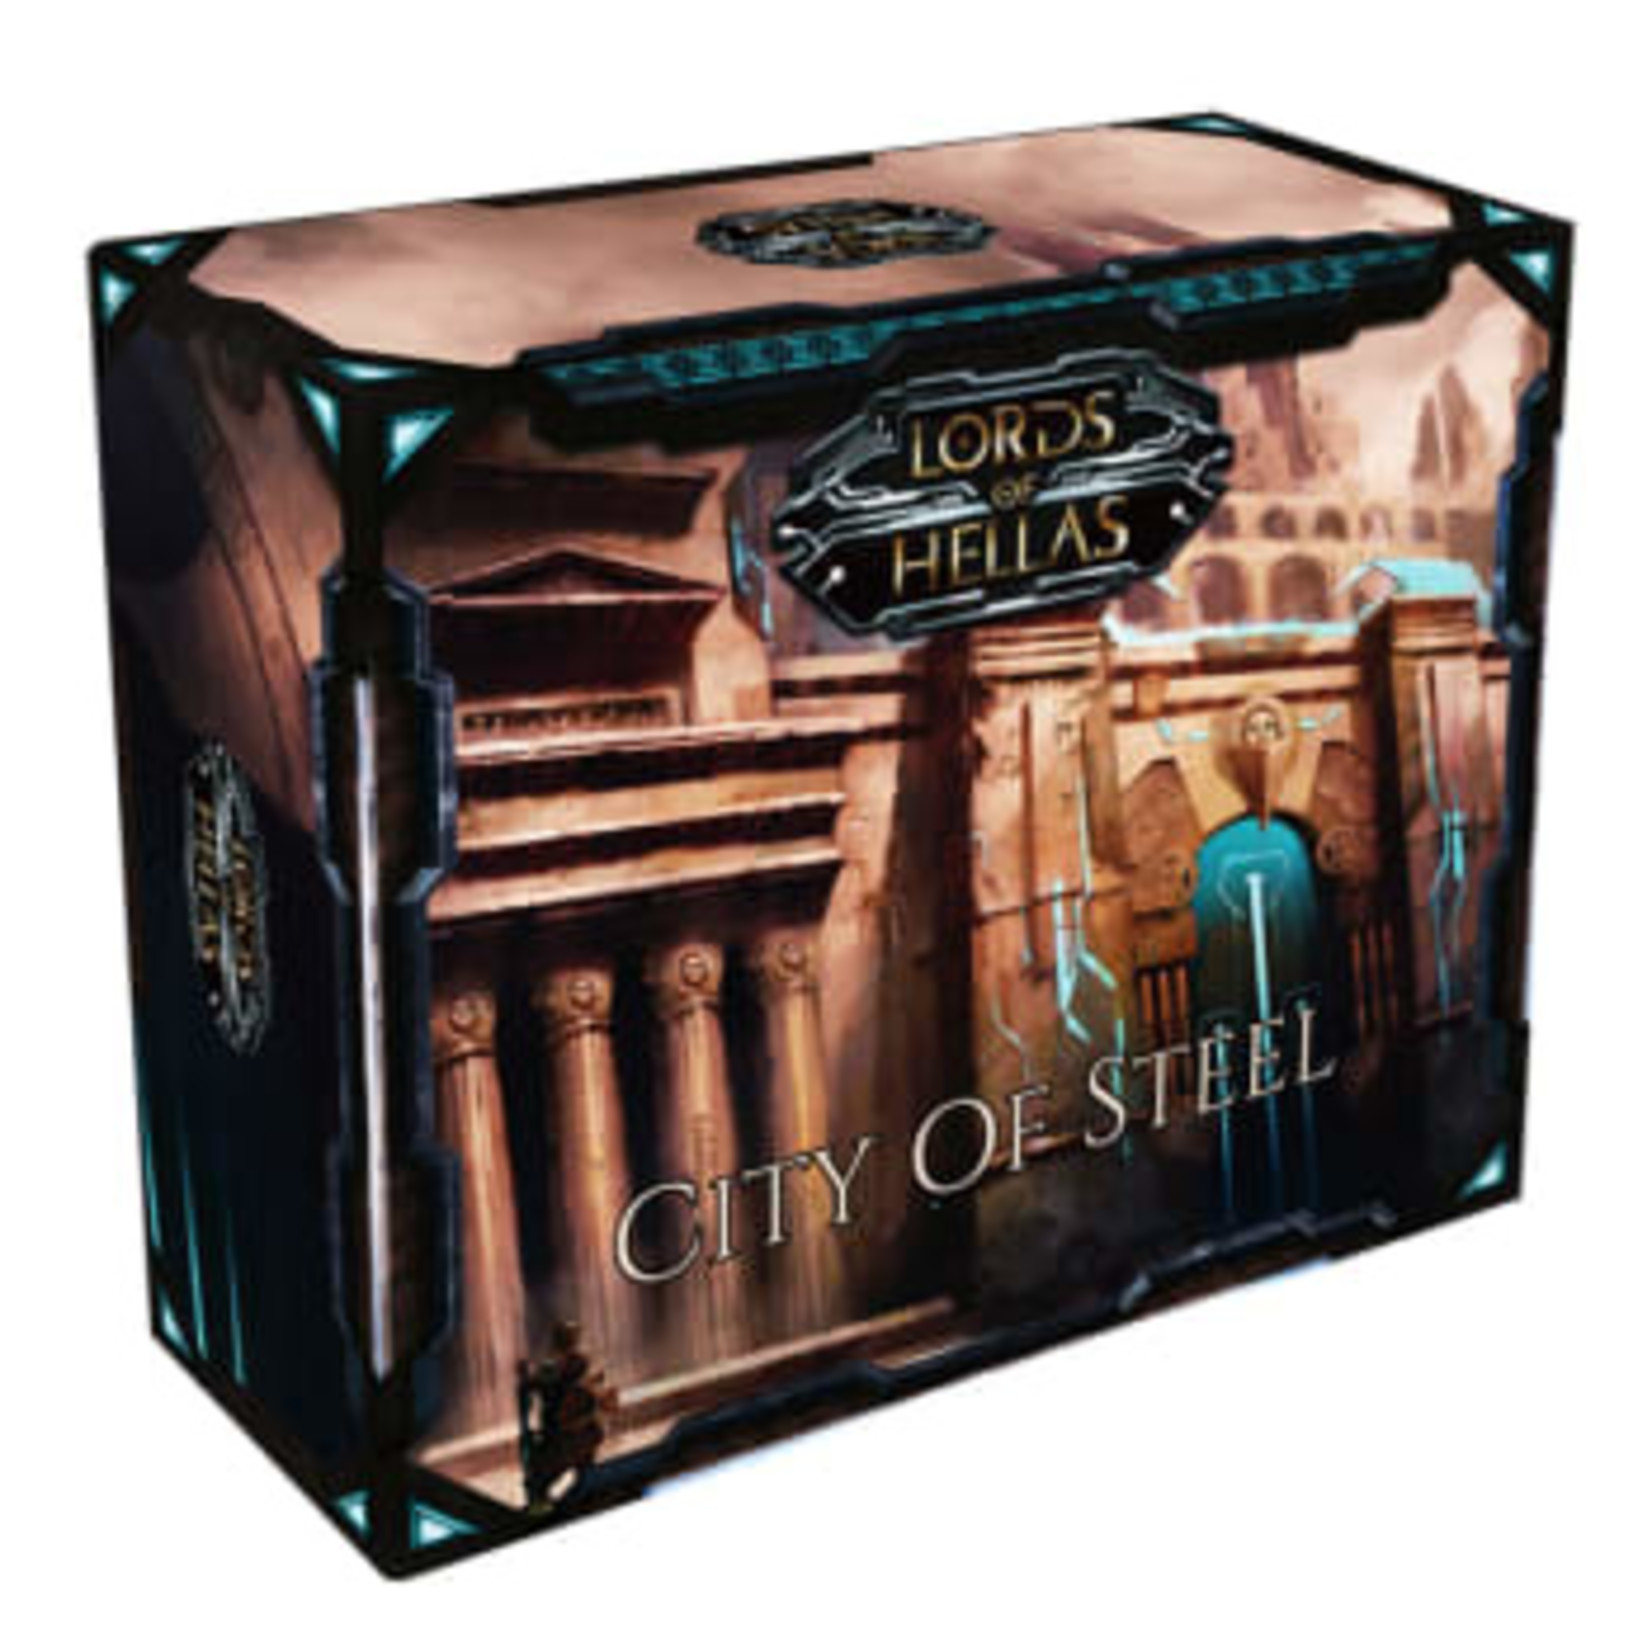 Awaken Realms Lords of Hellas: City of Steel